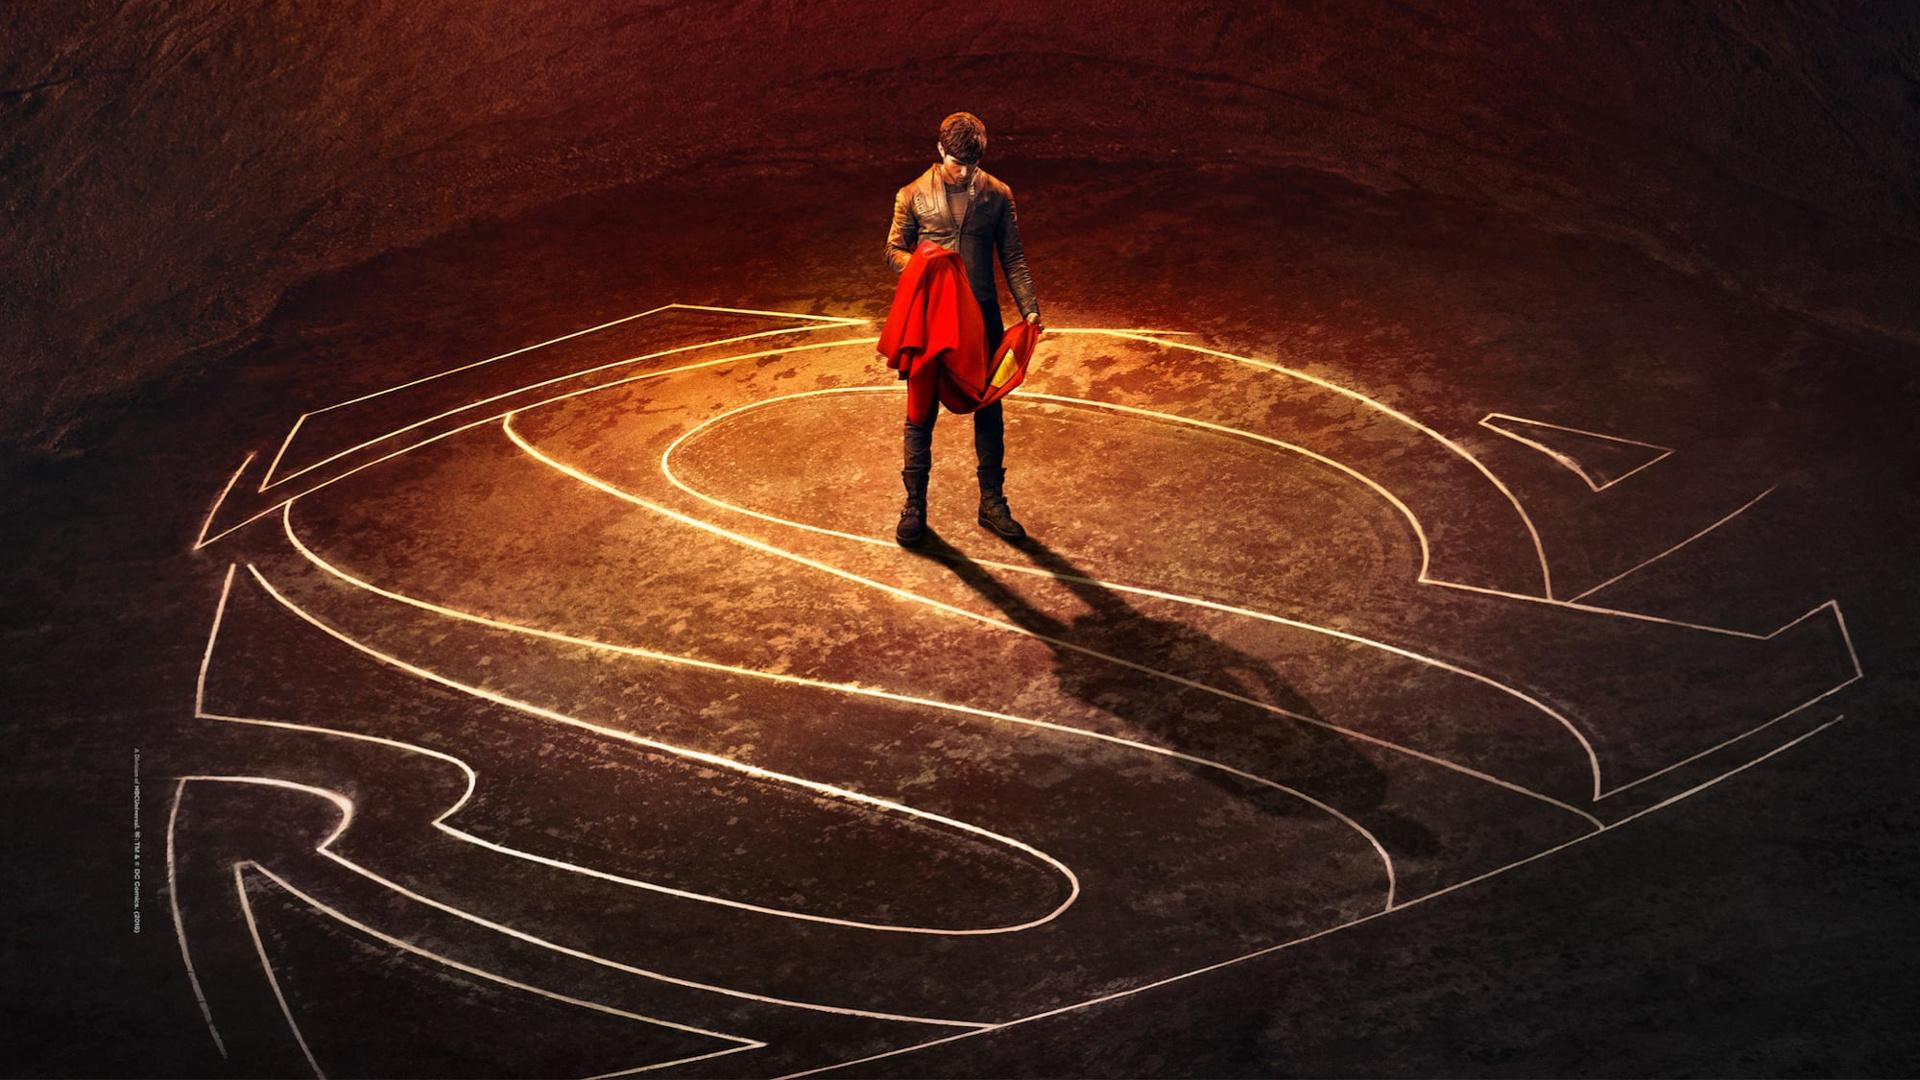 Krypton season 1 episode 9 watch online